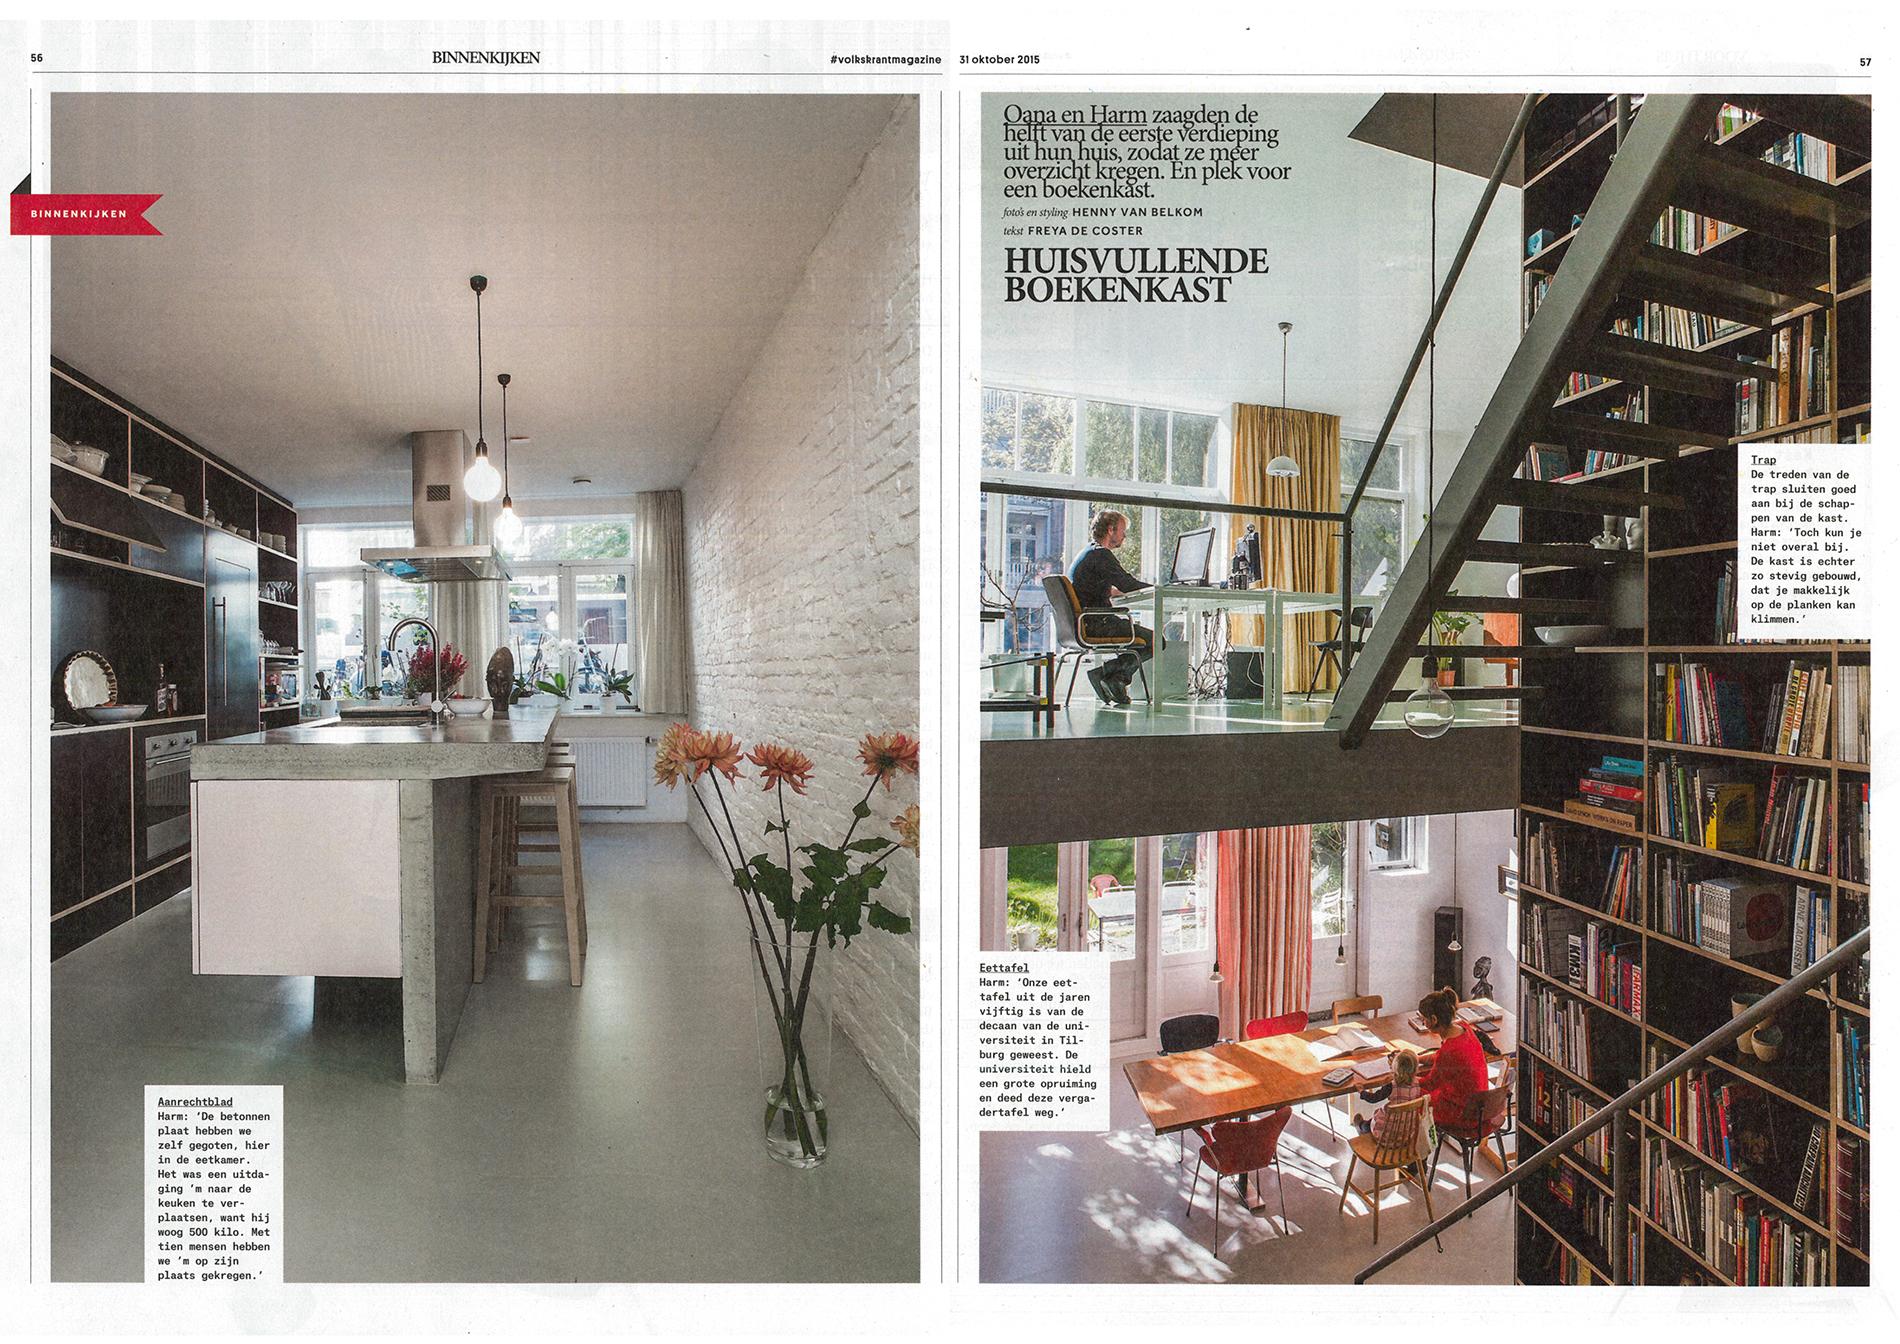 Grote Kast Eetkamer.1510 Volkskrant Magazine02 Shift